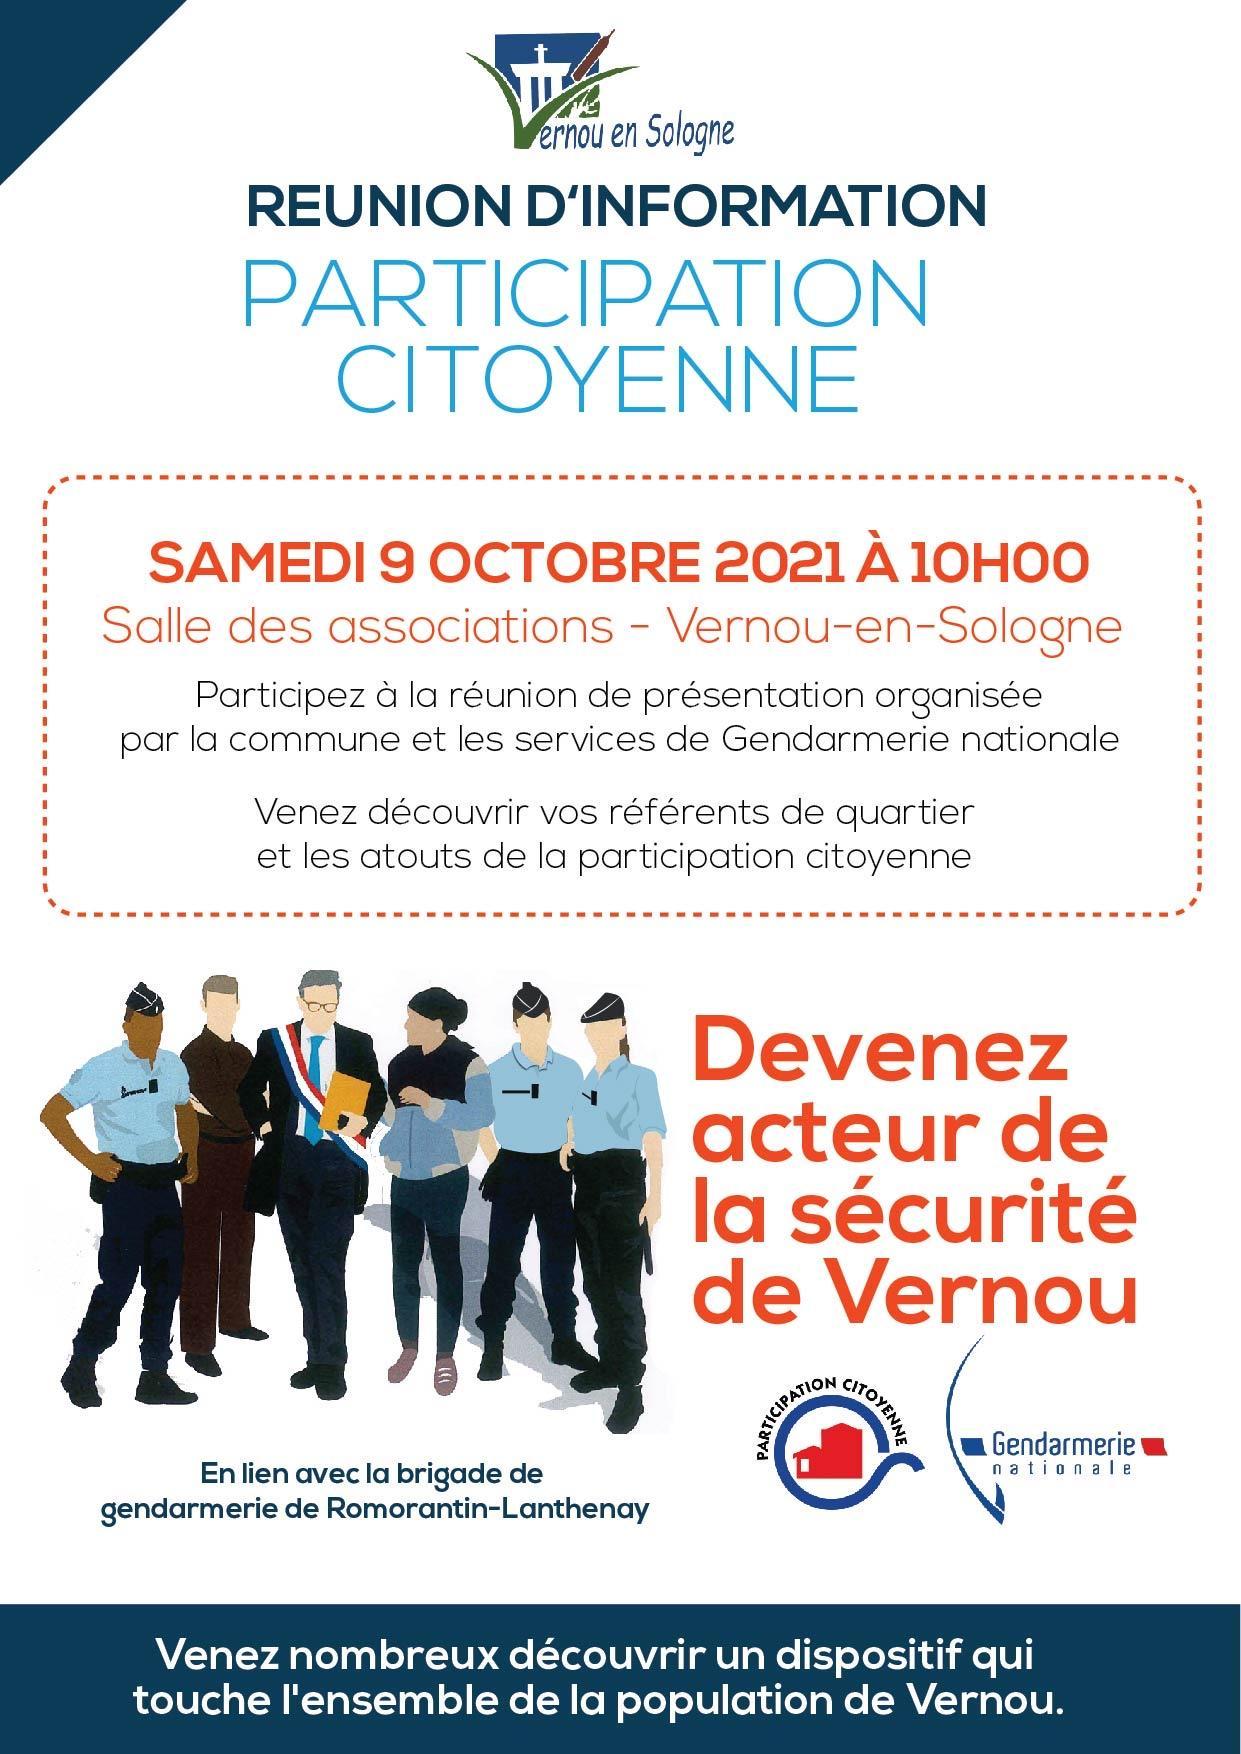 Participation Citoyenne